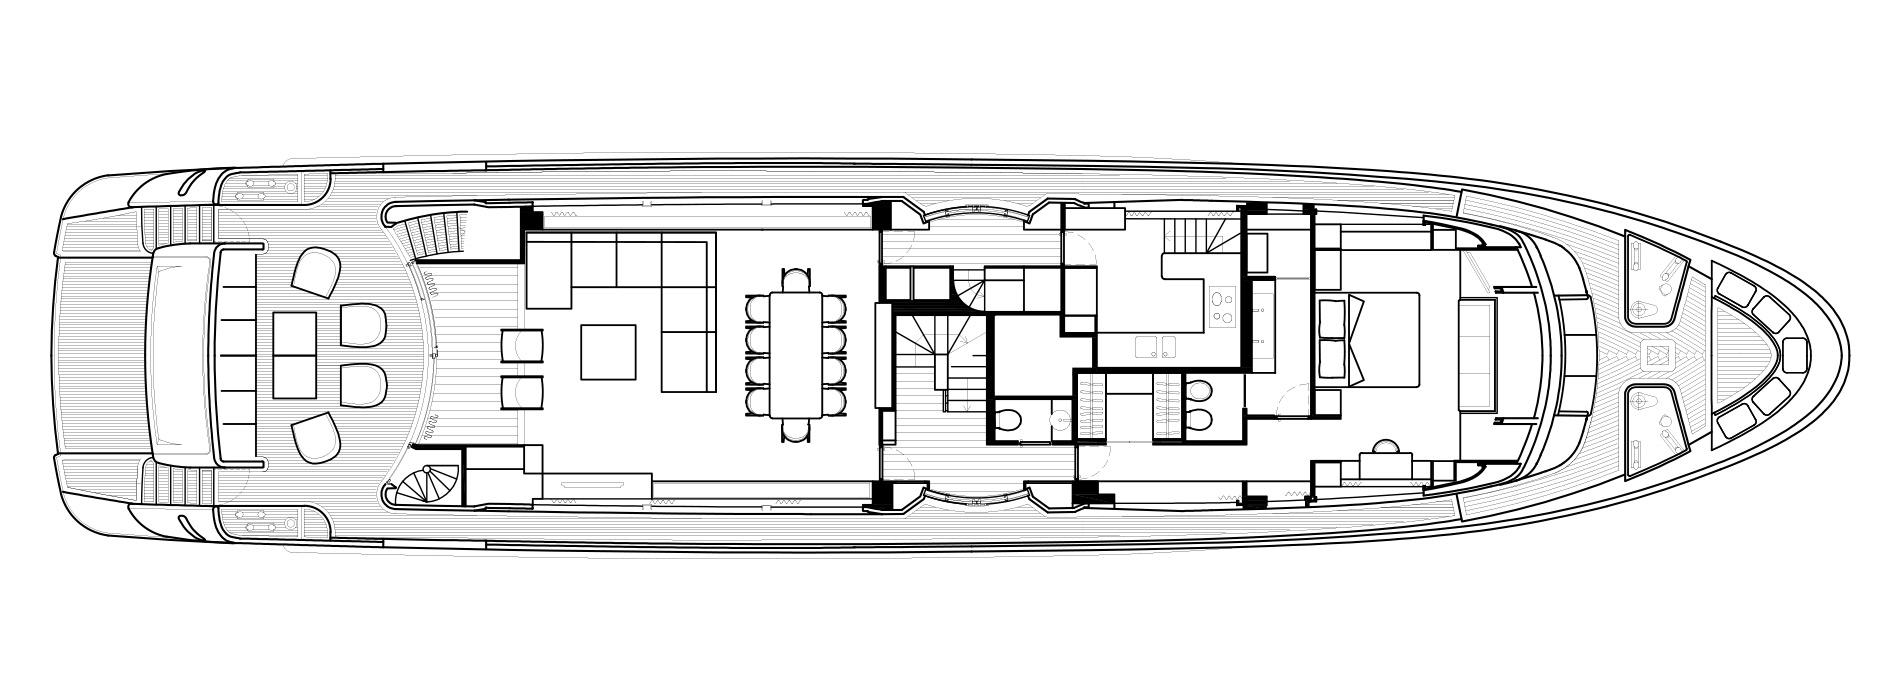 Sanlorenzo Yachts SD112 Cubierta principal Versione A